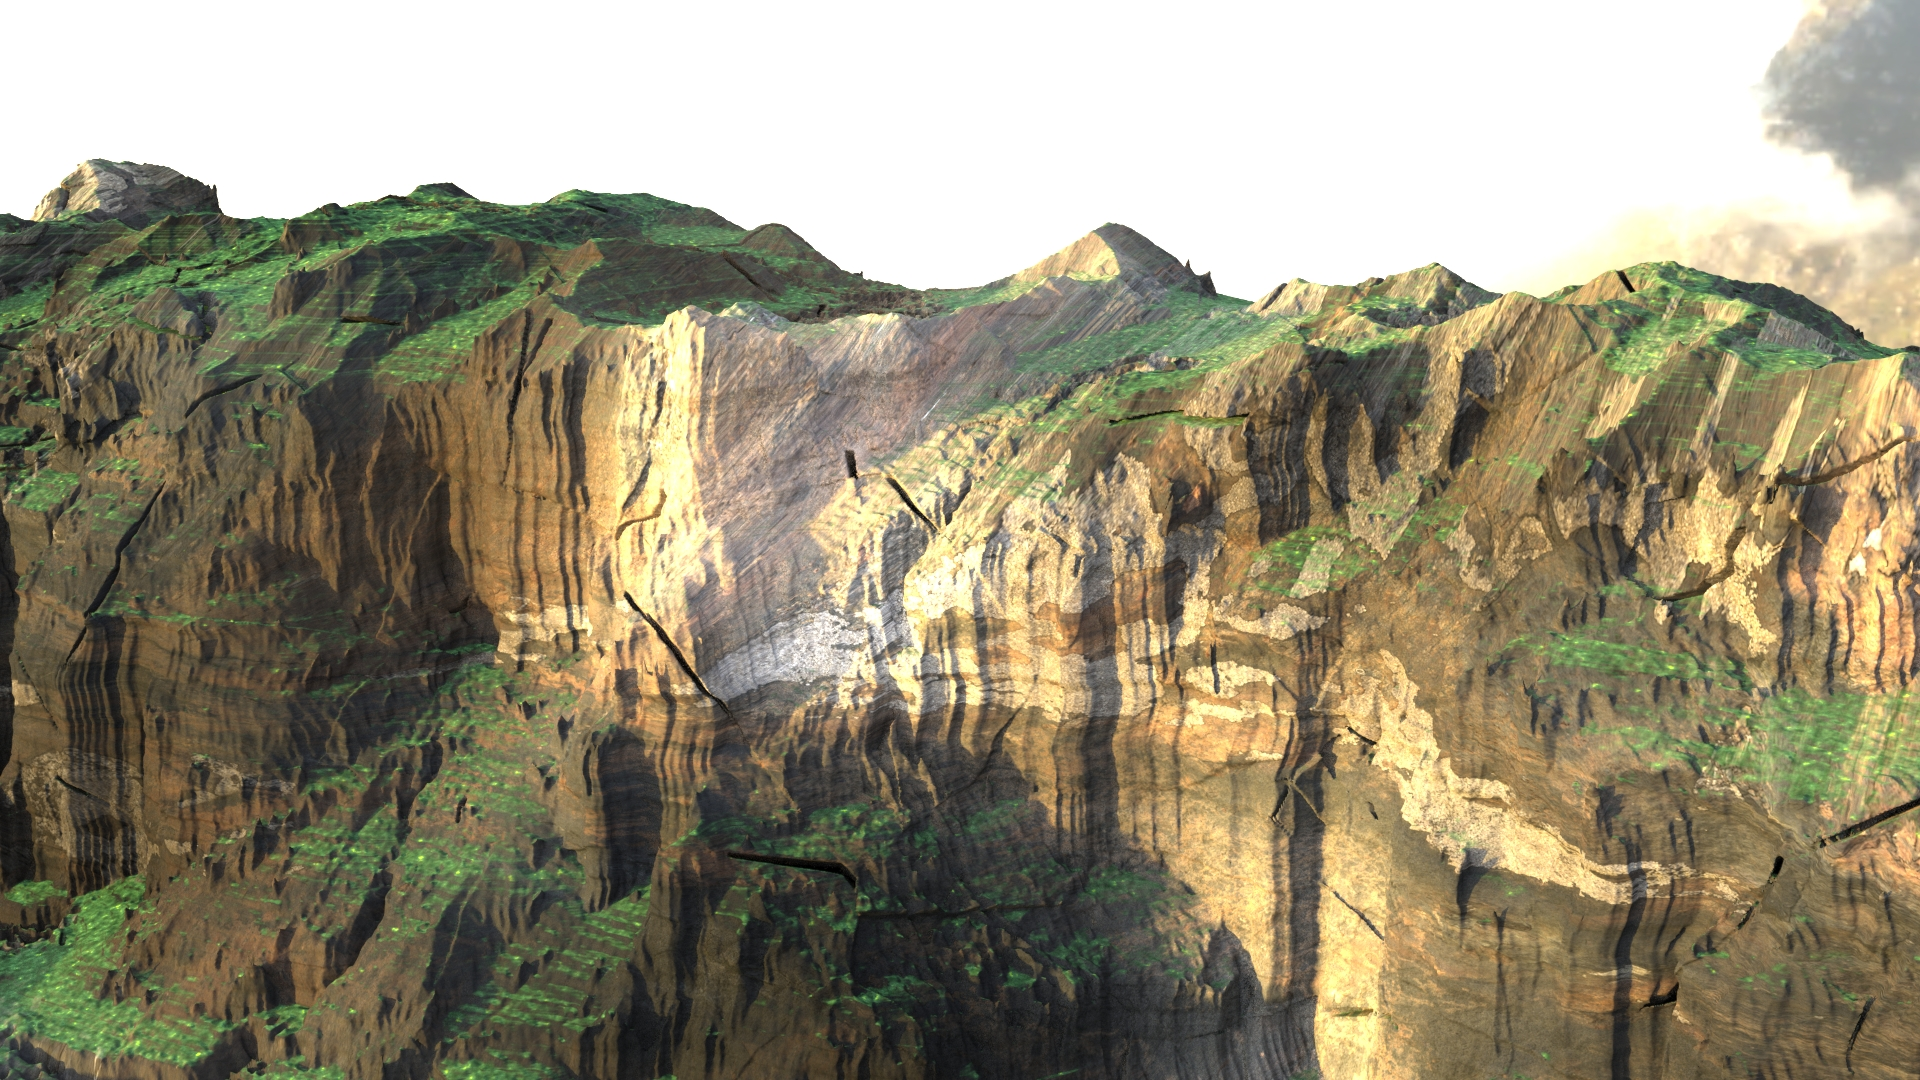 Landscape Version 2